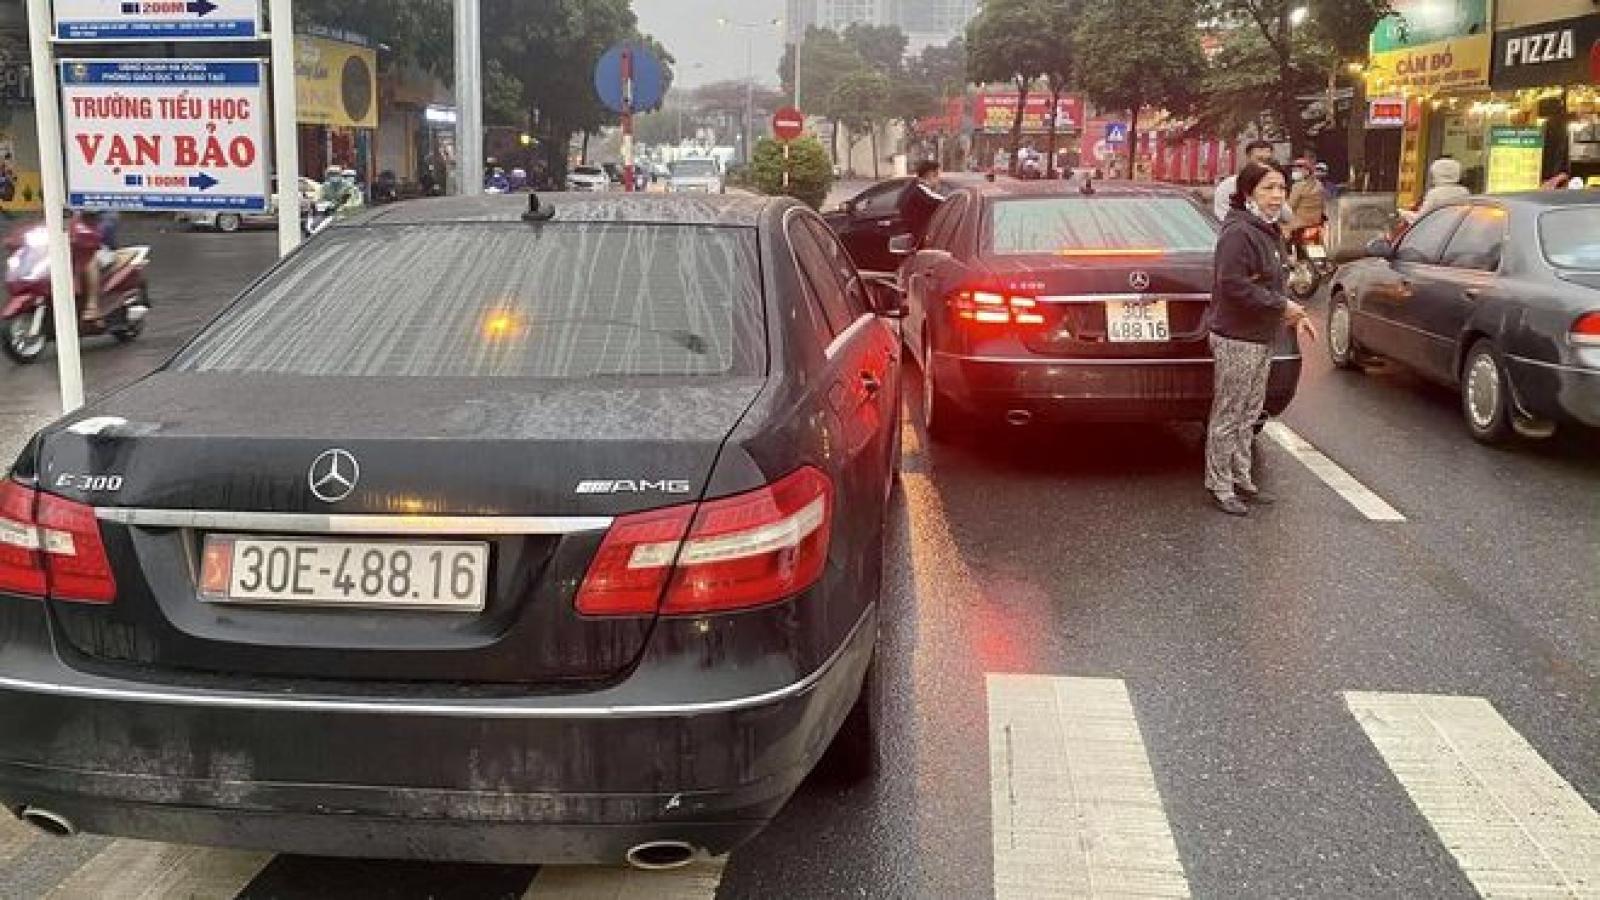 Vụ 2 xe Mercedes biển số giống hệt nhau: Trả lại xe gắn biển số thật